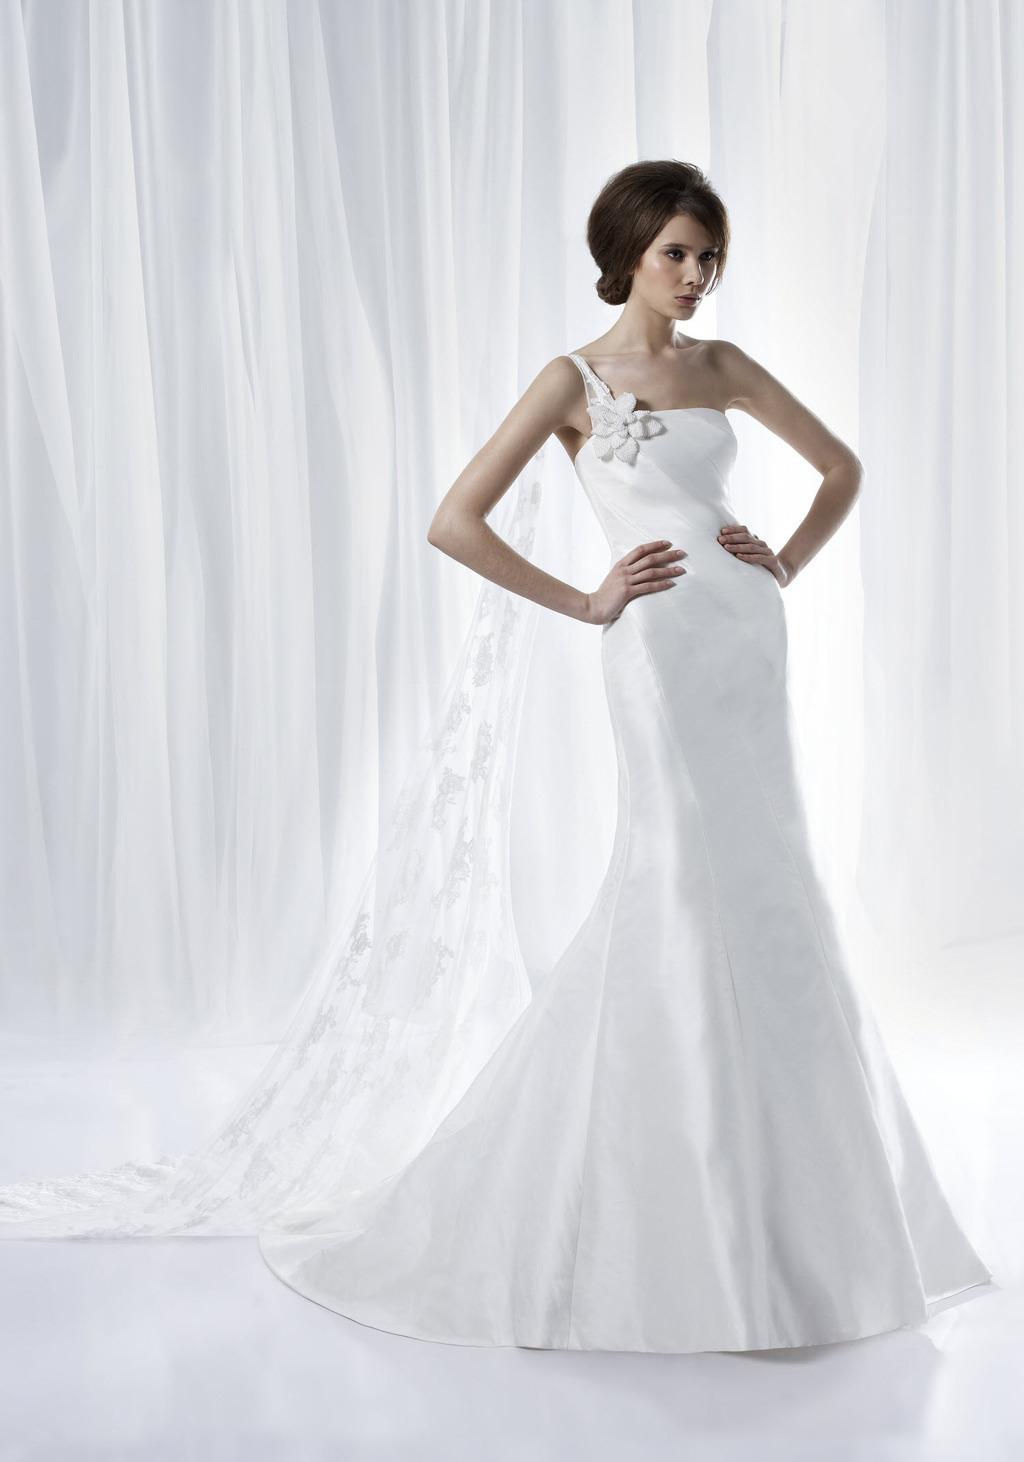 Simple-one-shoulder-white-wedding-dress-mermaid-spring-2012-anjolique-c114a.full